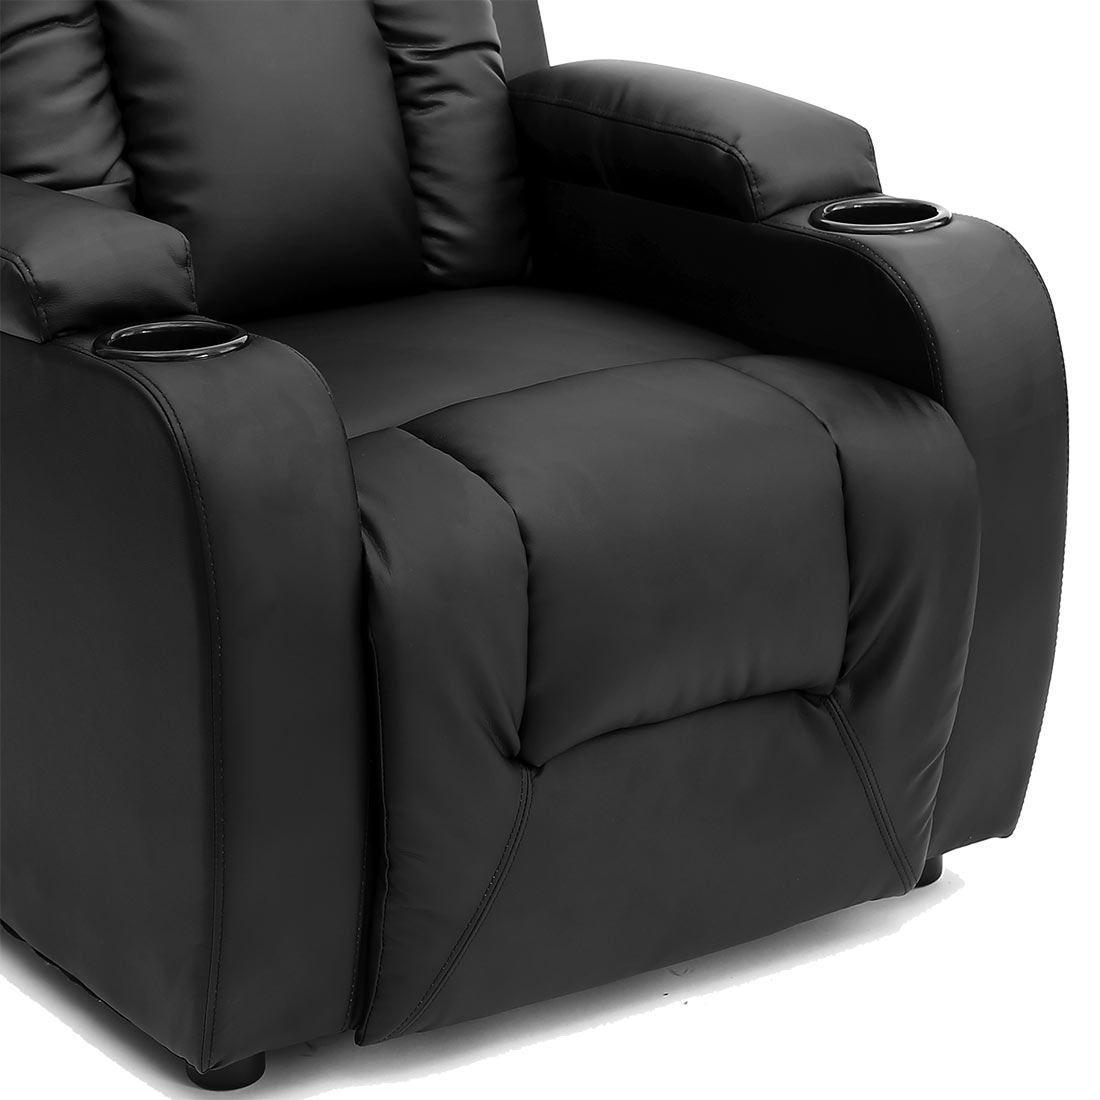 item specifics - Black Leather Recliner